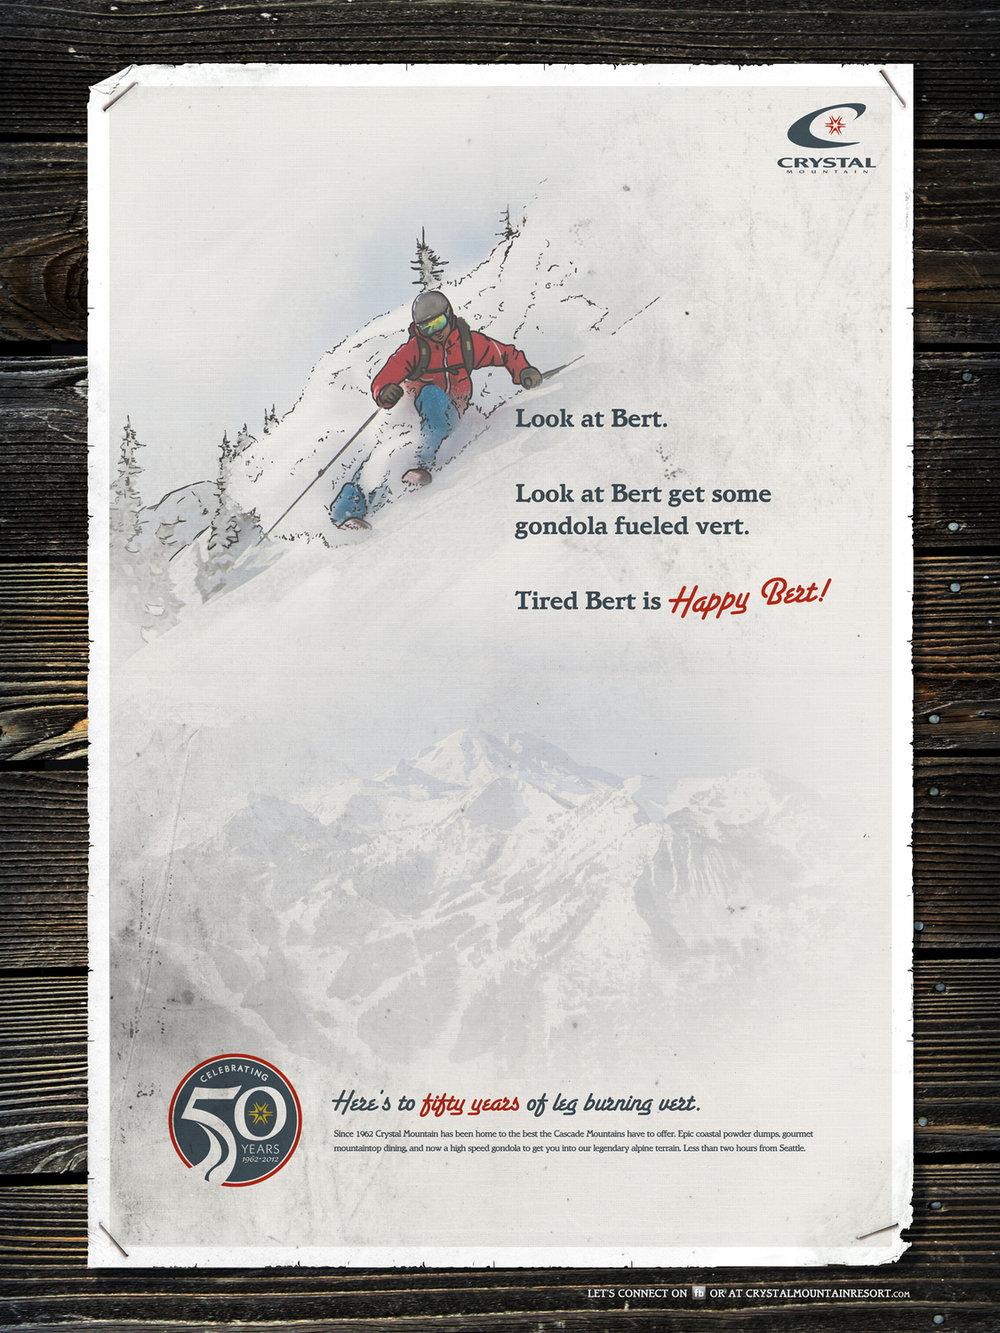 Crystal Mountain Print Advertising 03.jpg